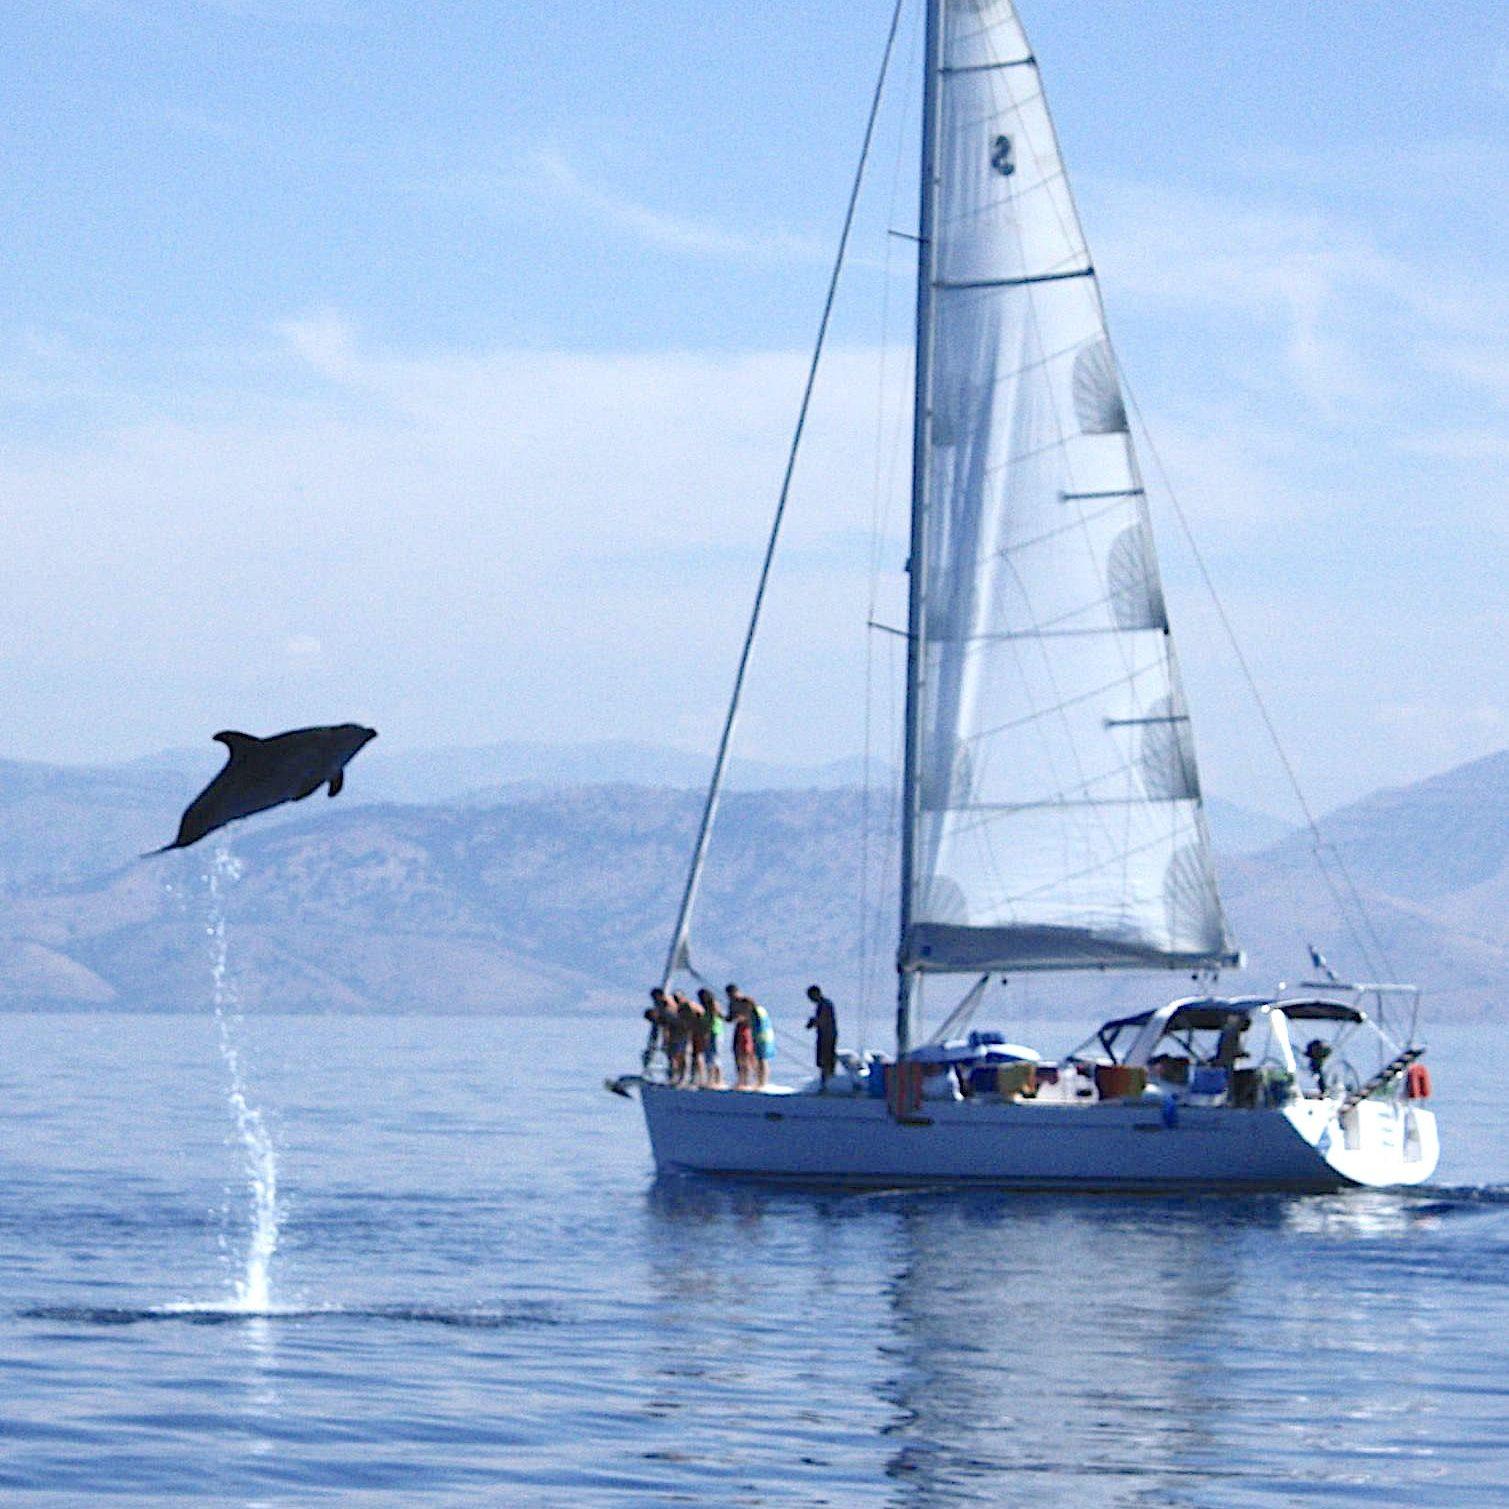 [:sv]Hoppande delfin[:]